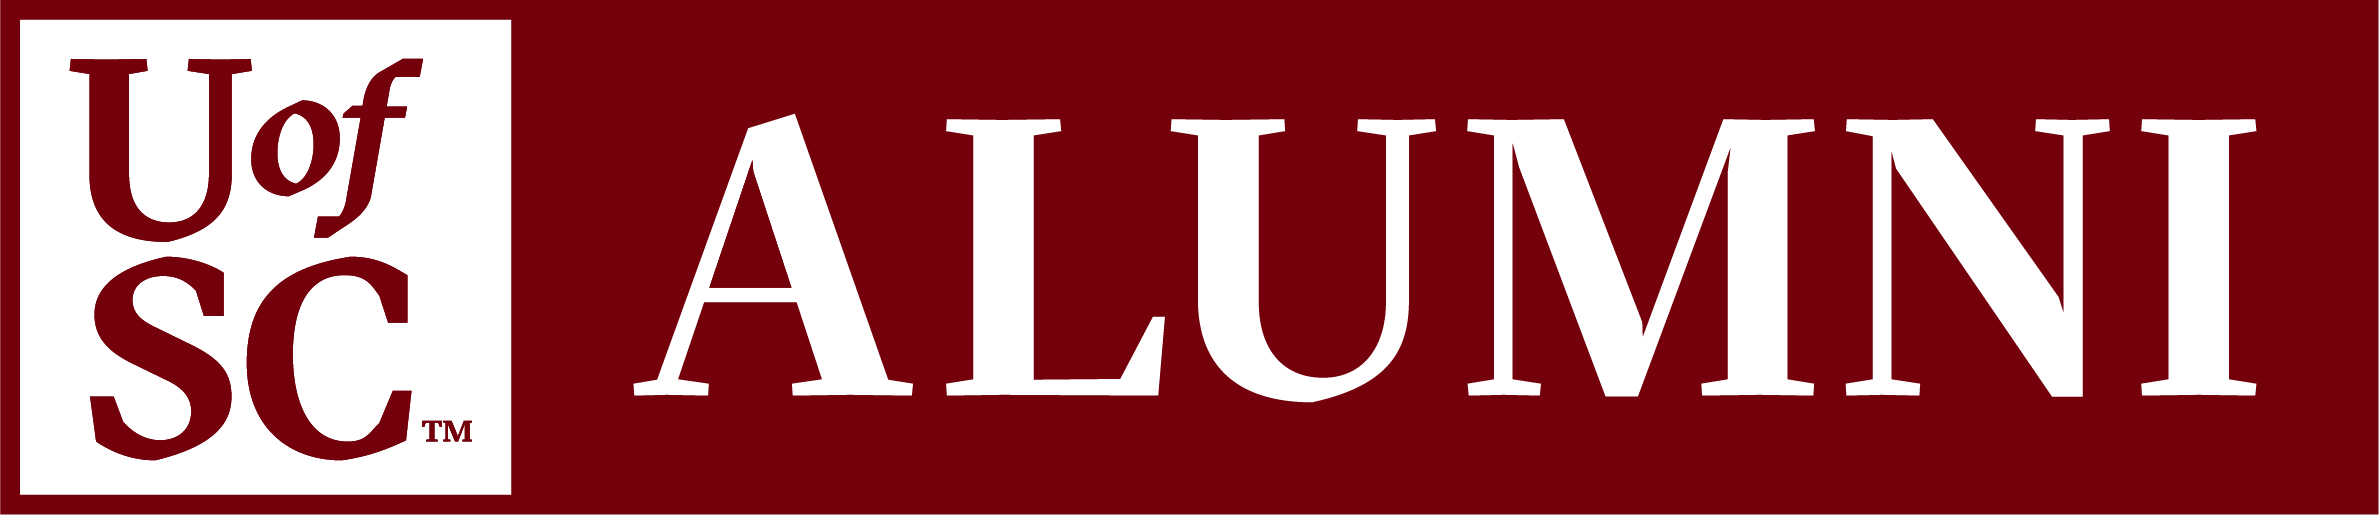 UofSC-Alumni-Primary_Horizontal